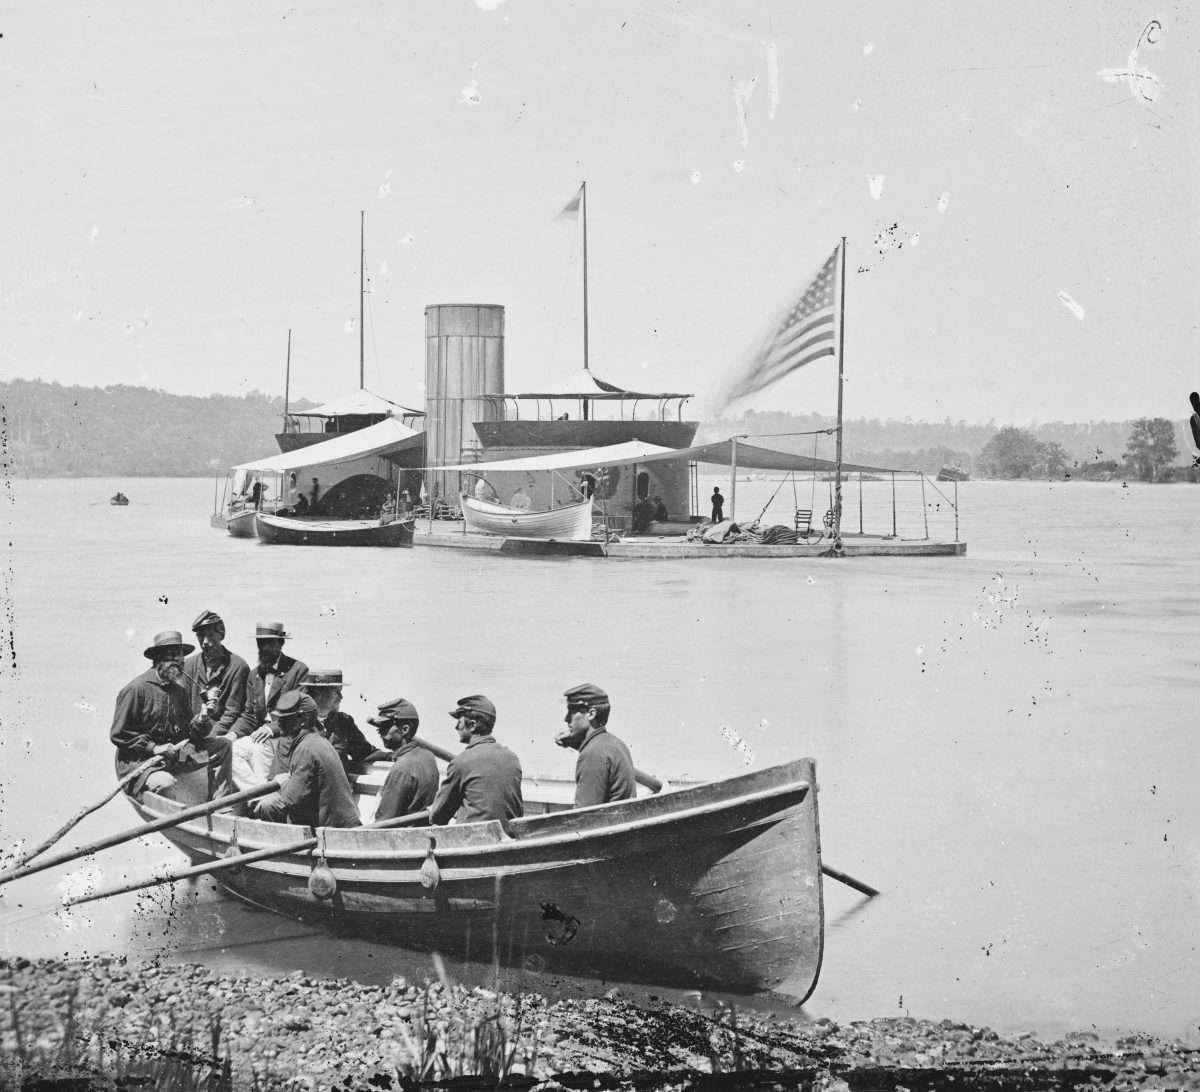 Monitor USS Onondaga on the James River